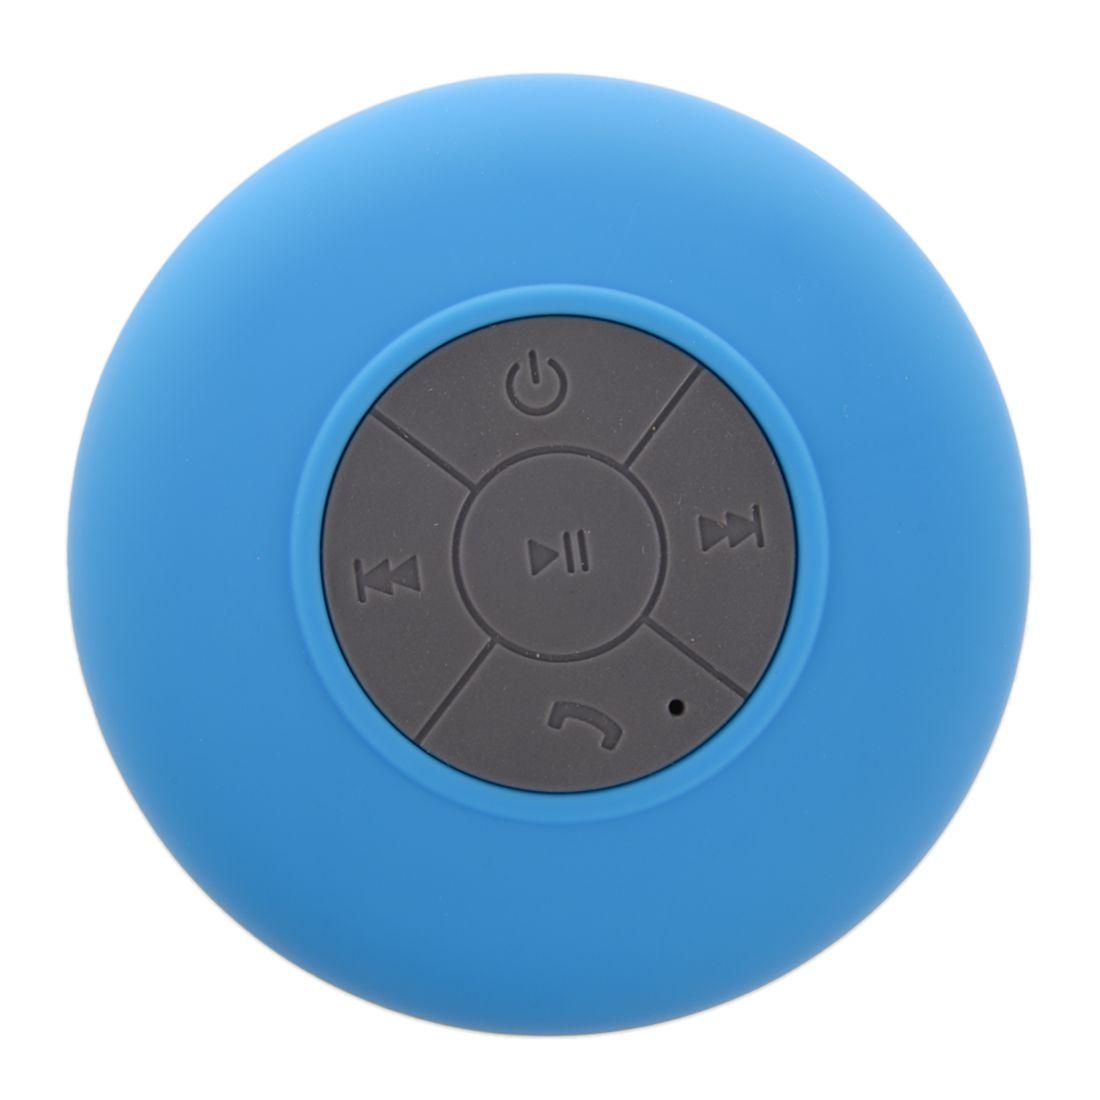 CES Portable Car Bathroom Handsfree Wireless Bluetooth Speaker (Blue)  #Affiliate